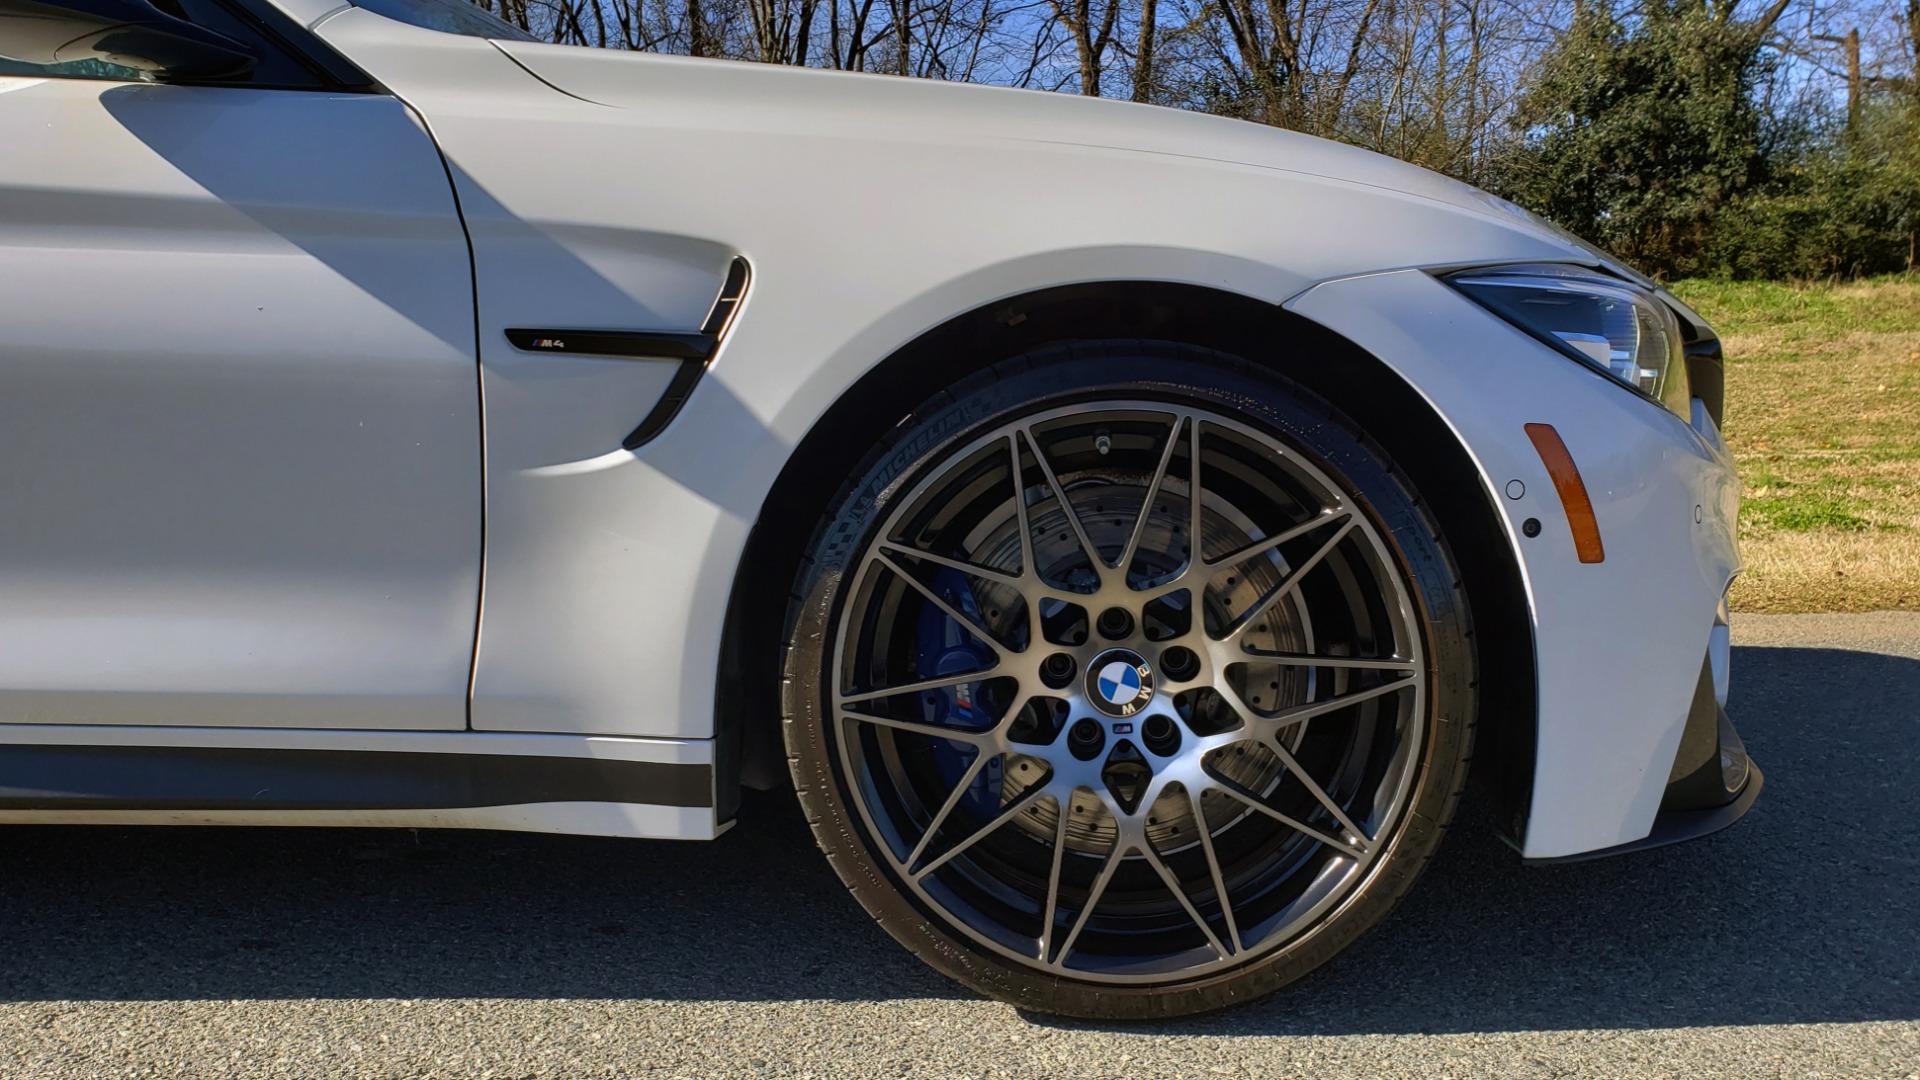 Used 2018 BMW M4 COMP PKG / EXEC / M-DRIVER / PARK CNTRL / ACTIVE BLIND SPOT for sale Sold at Formula Imports in Charlotte NC 28227 77